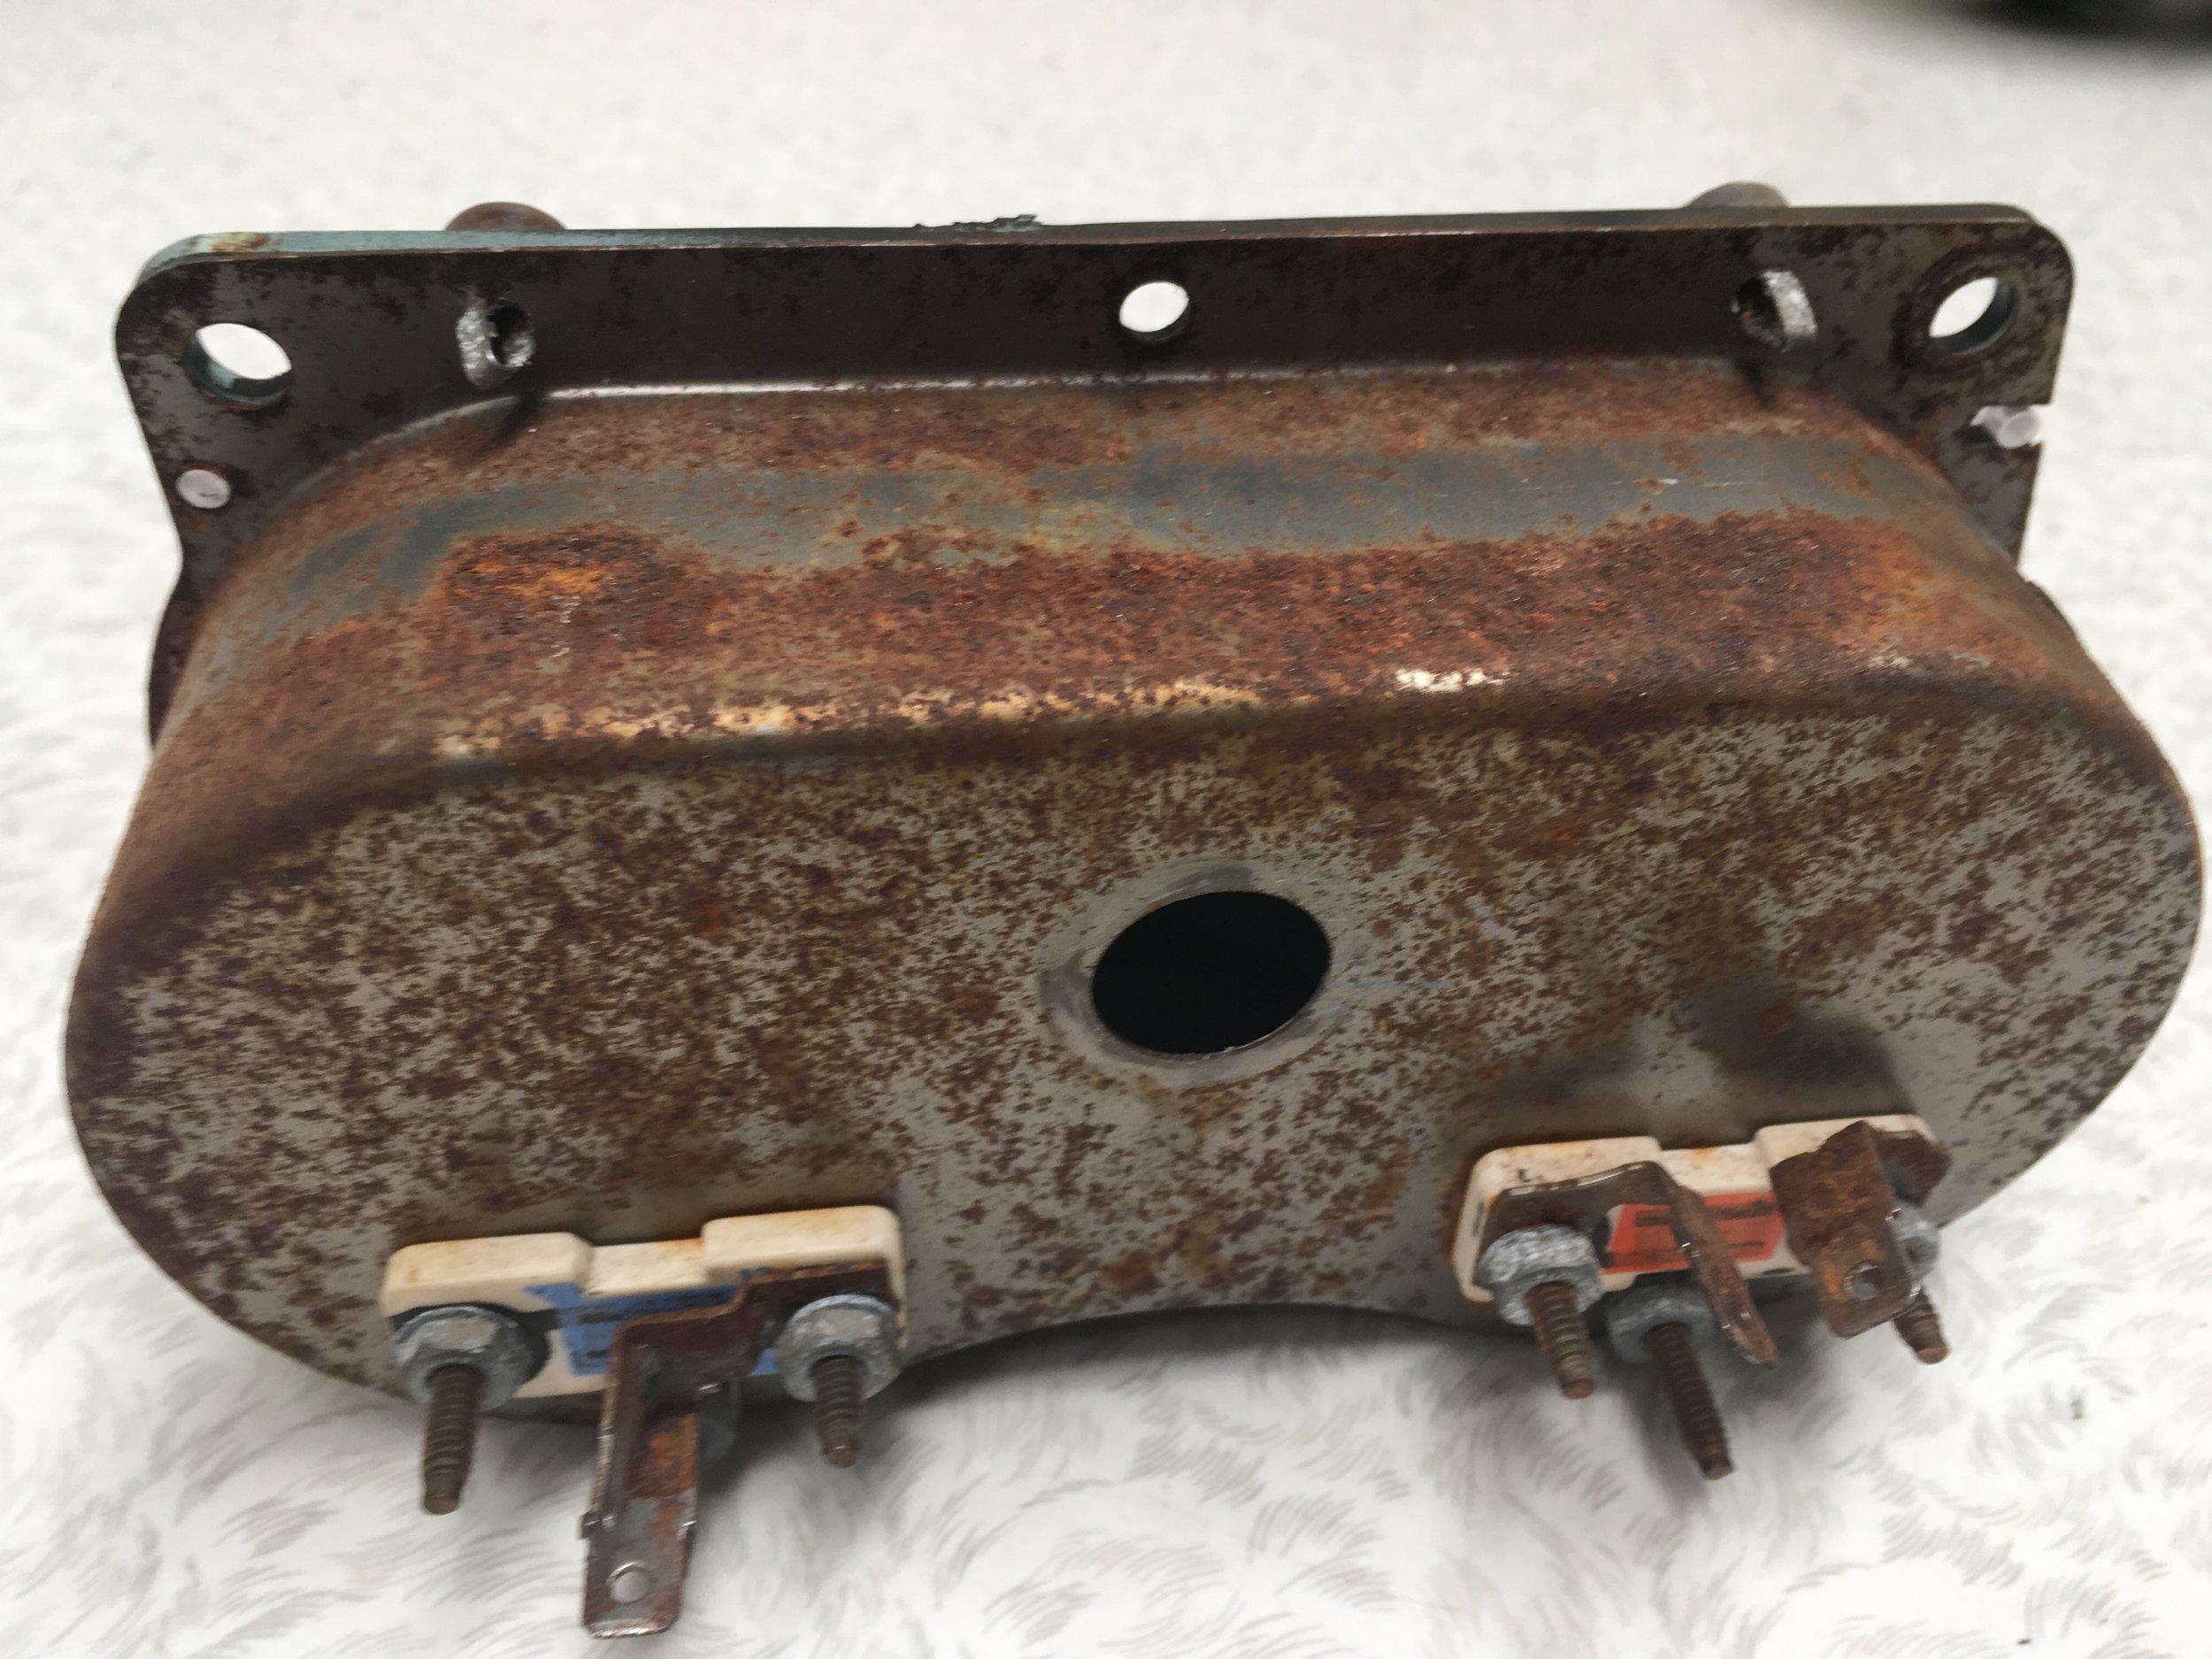 Fuel & Volts Cluster - Rear BEFORE restoration